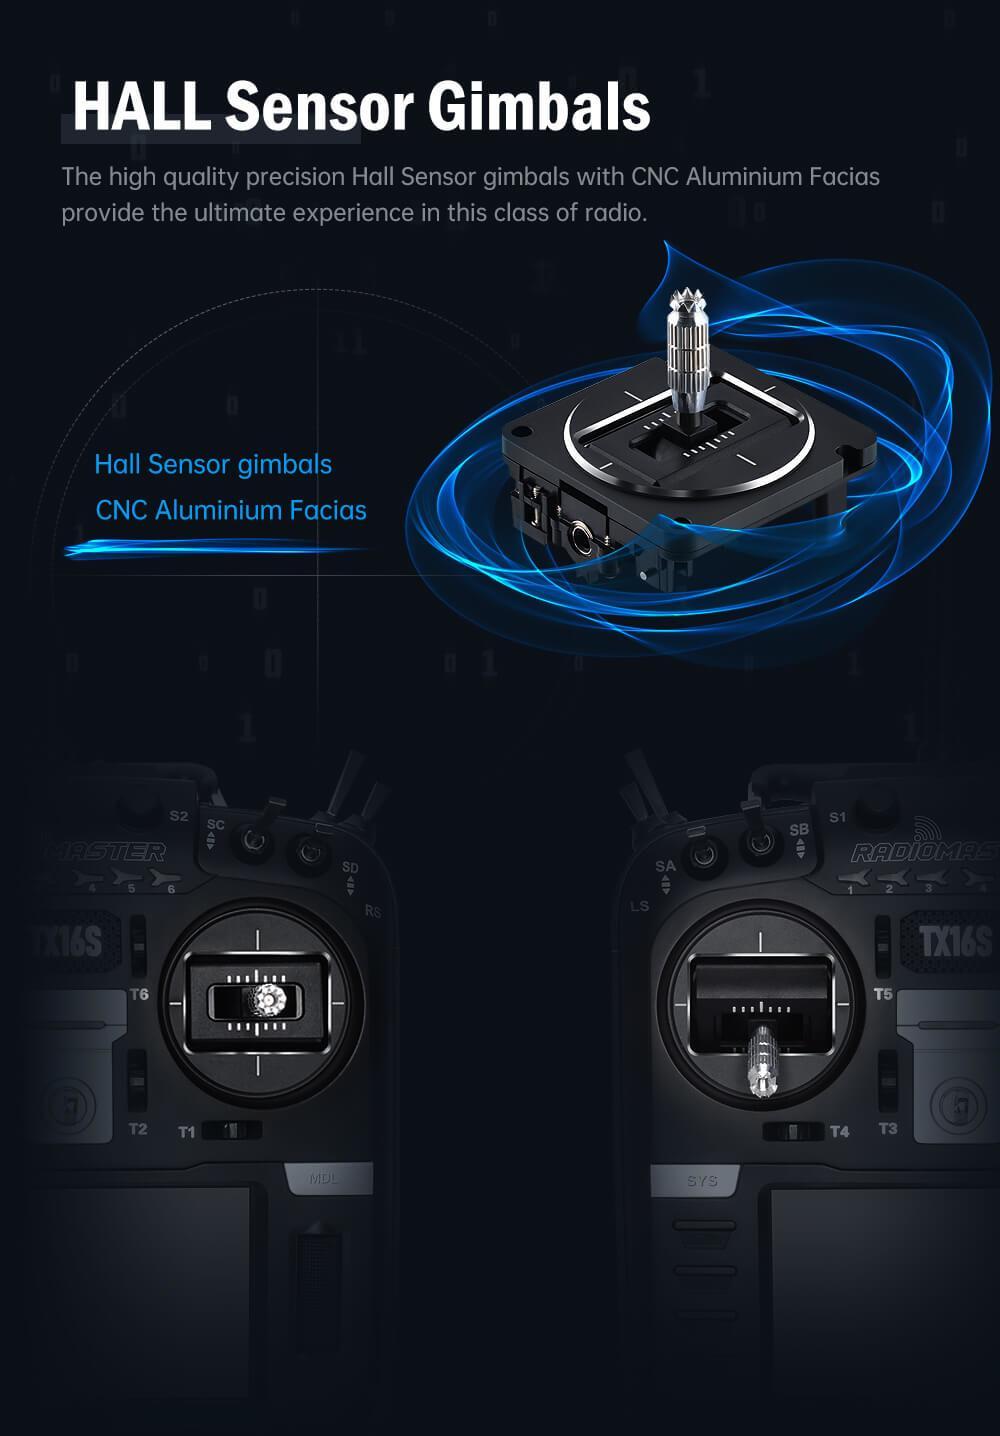 hall sensor gimbals as standard